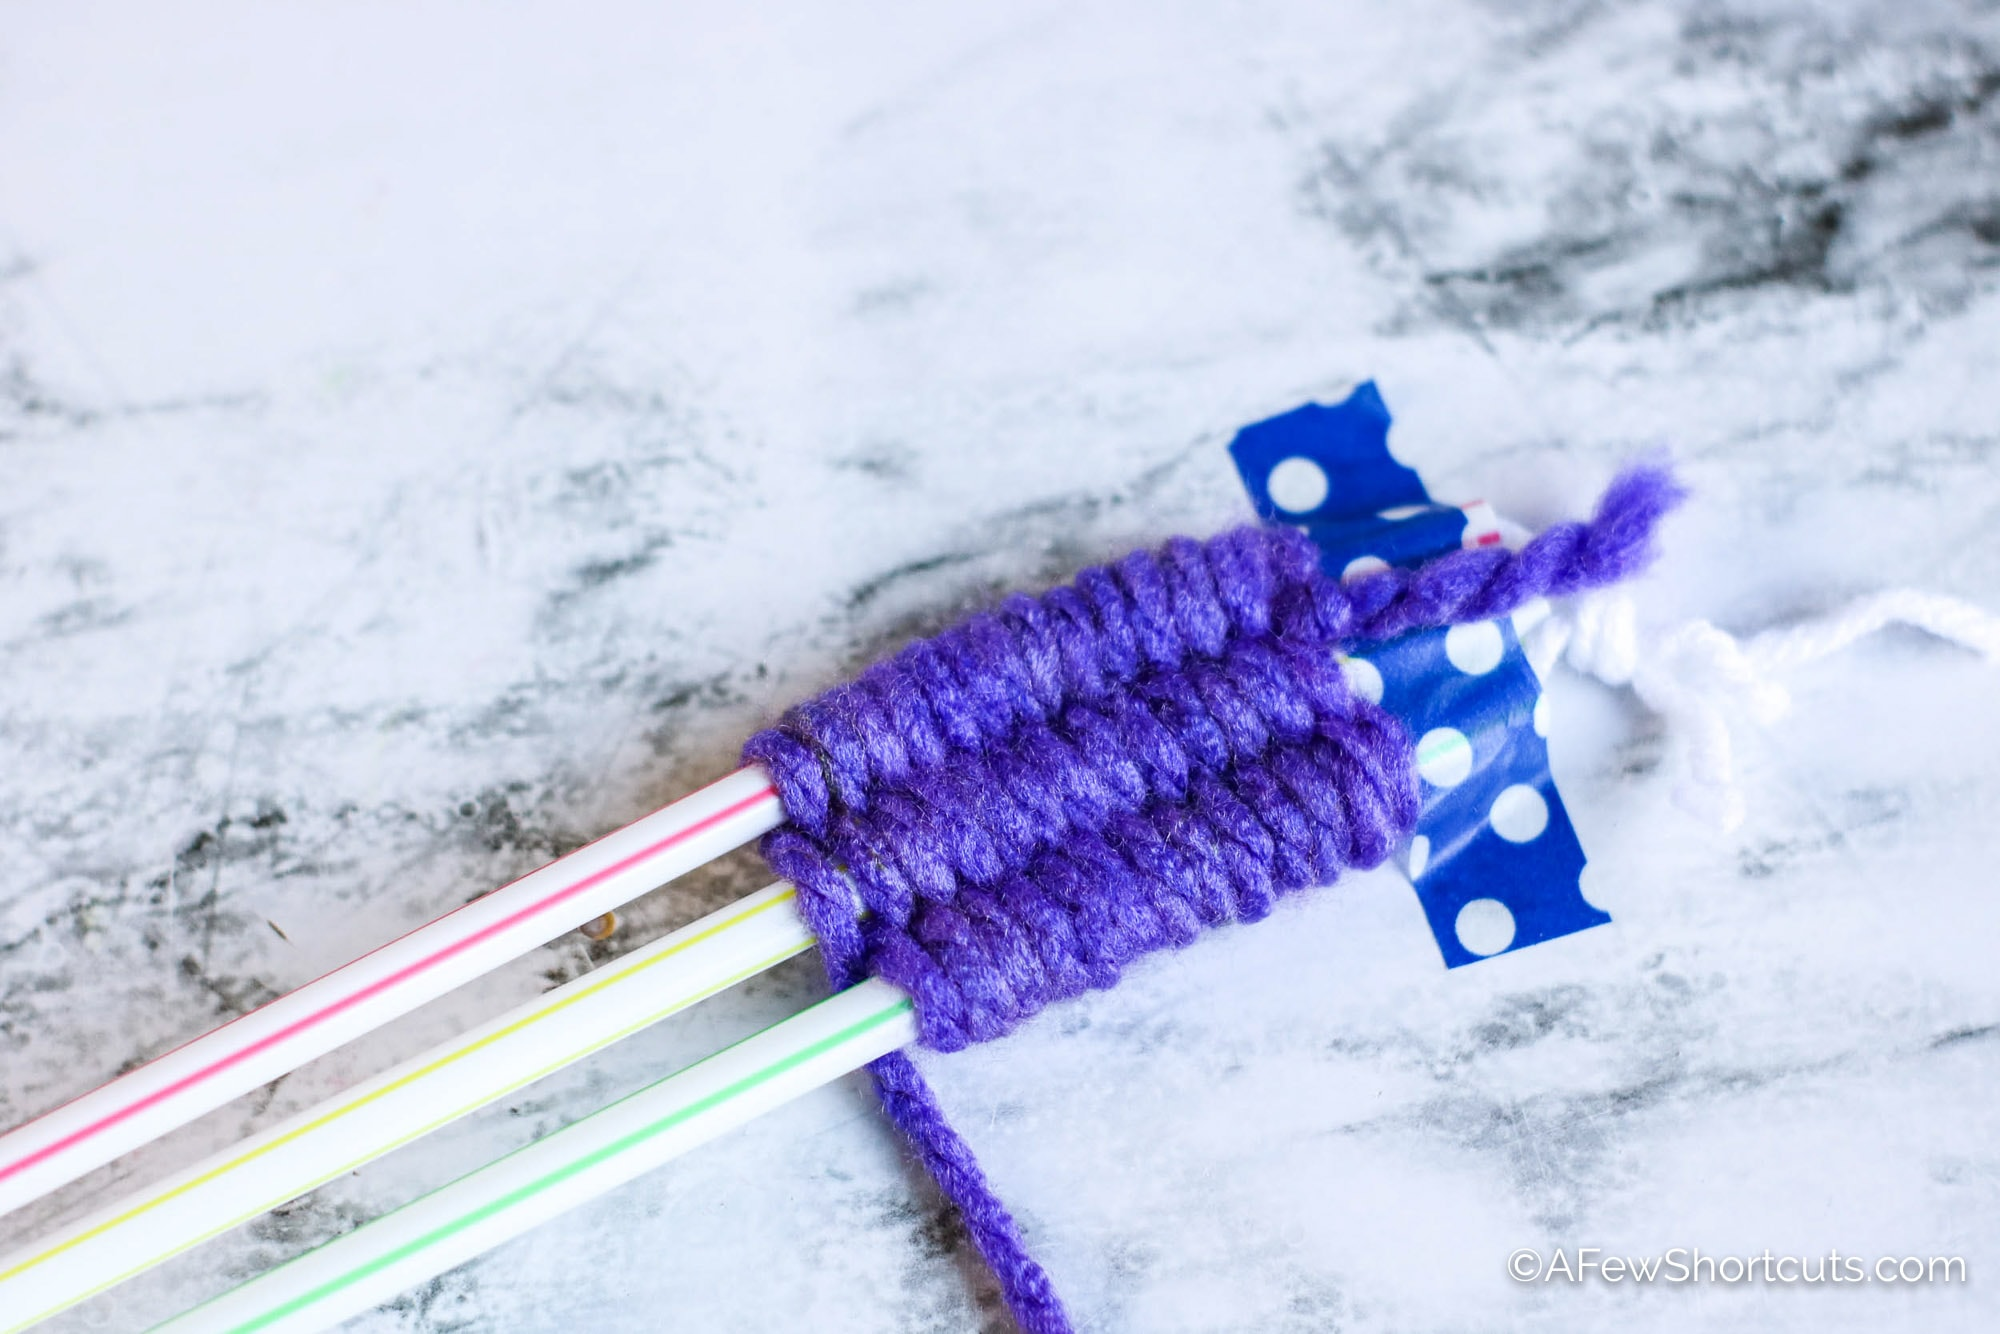 Straw weaving with purple yarn